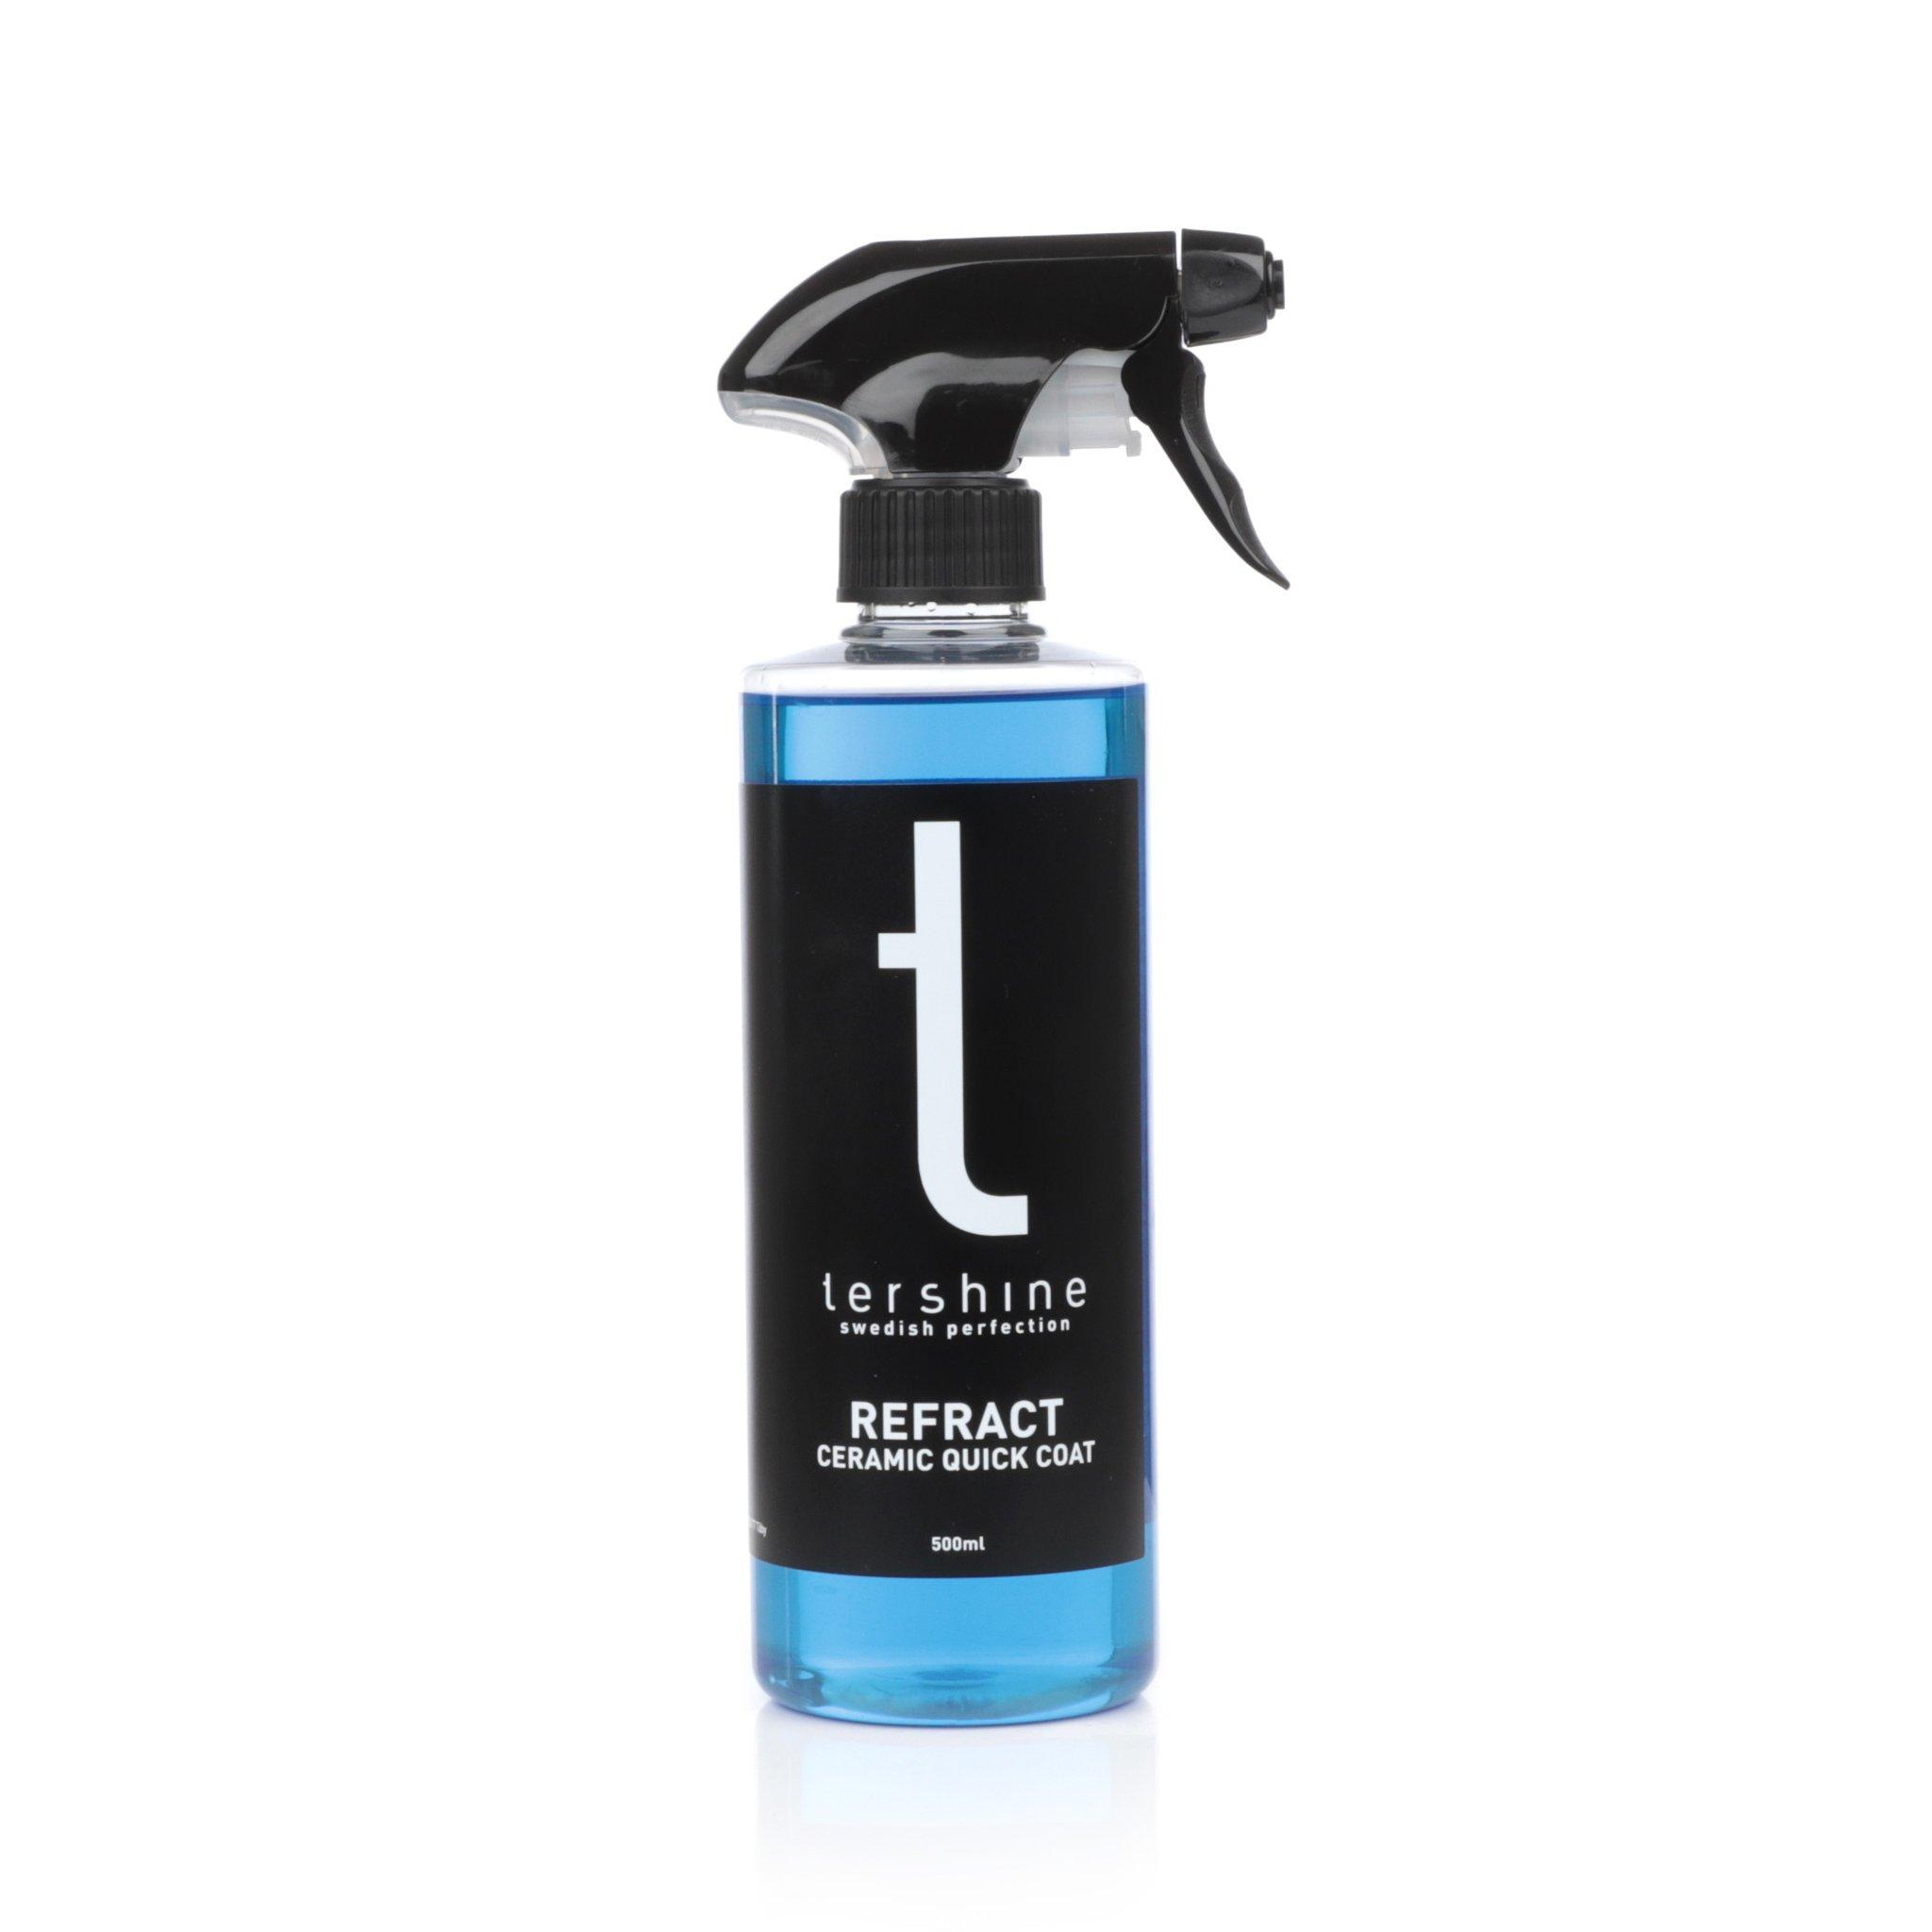 Snabbförsegling tershine Refract, 500 ml, Flaska + Mikrofiberdukar